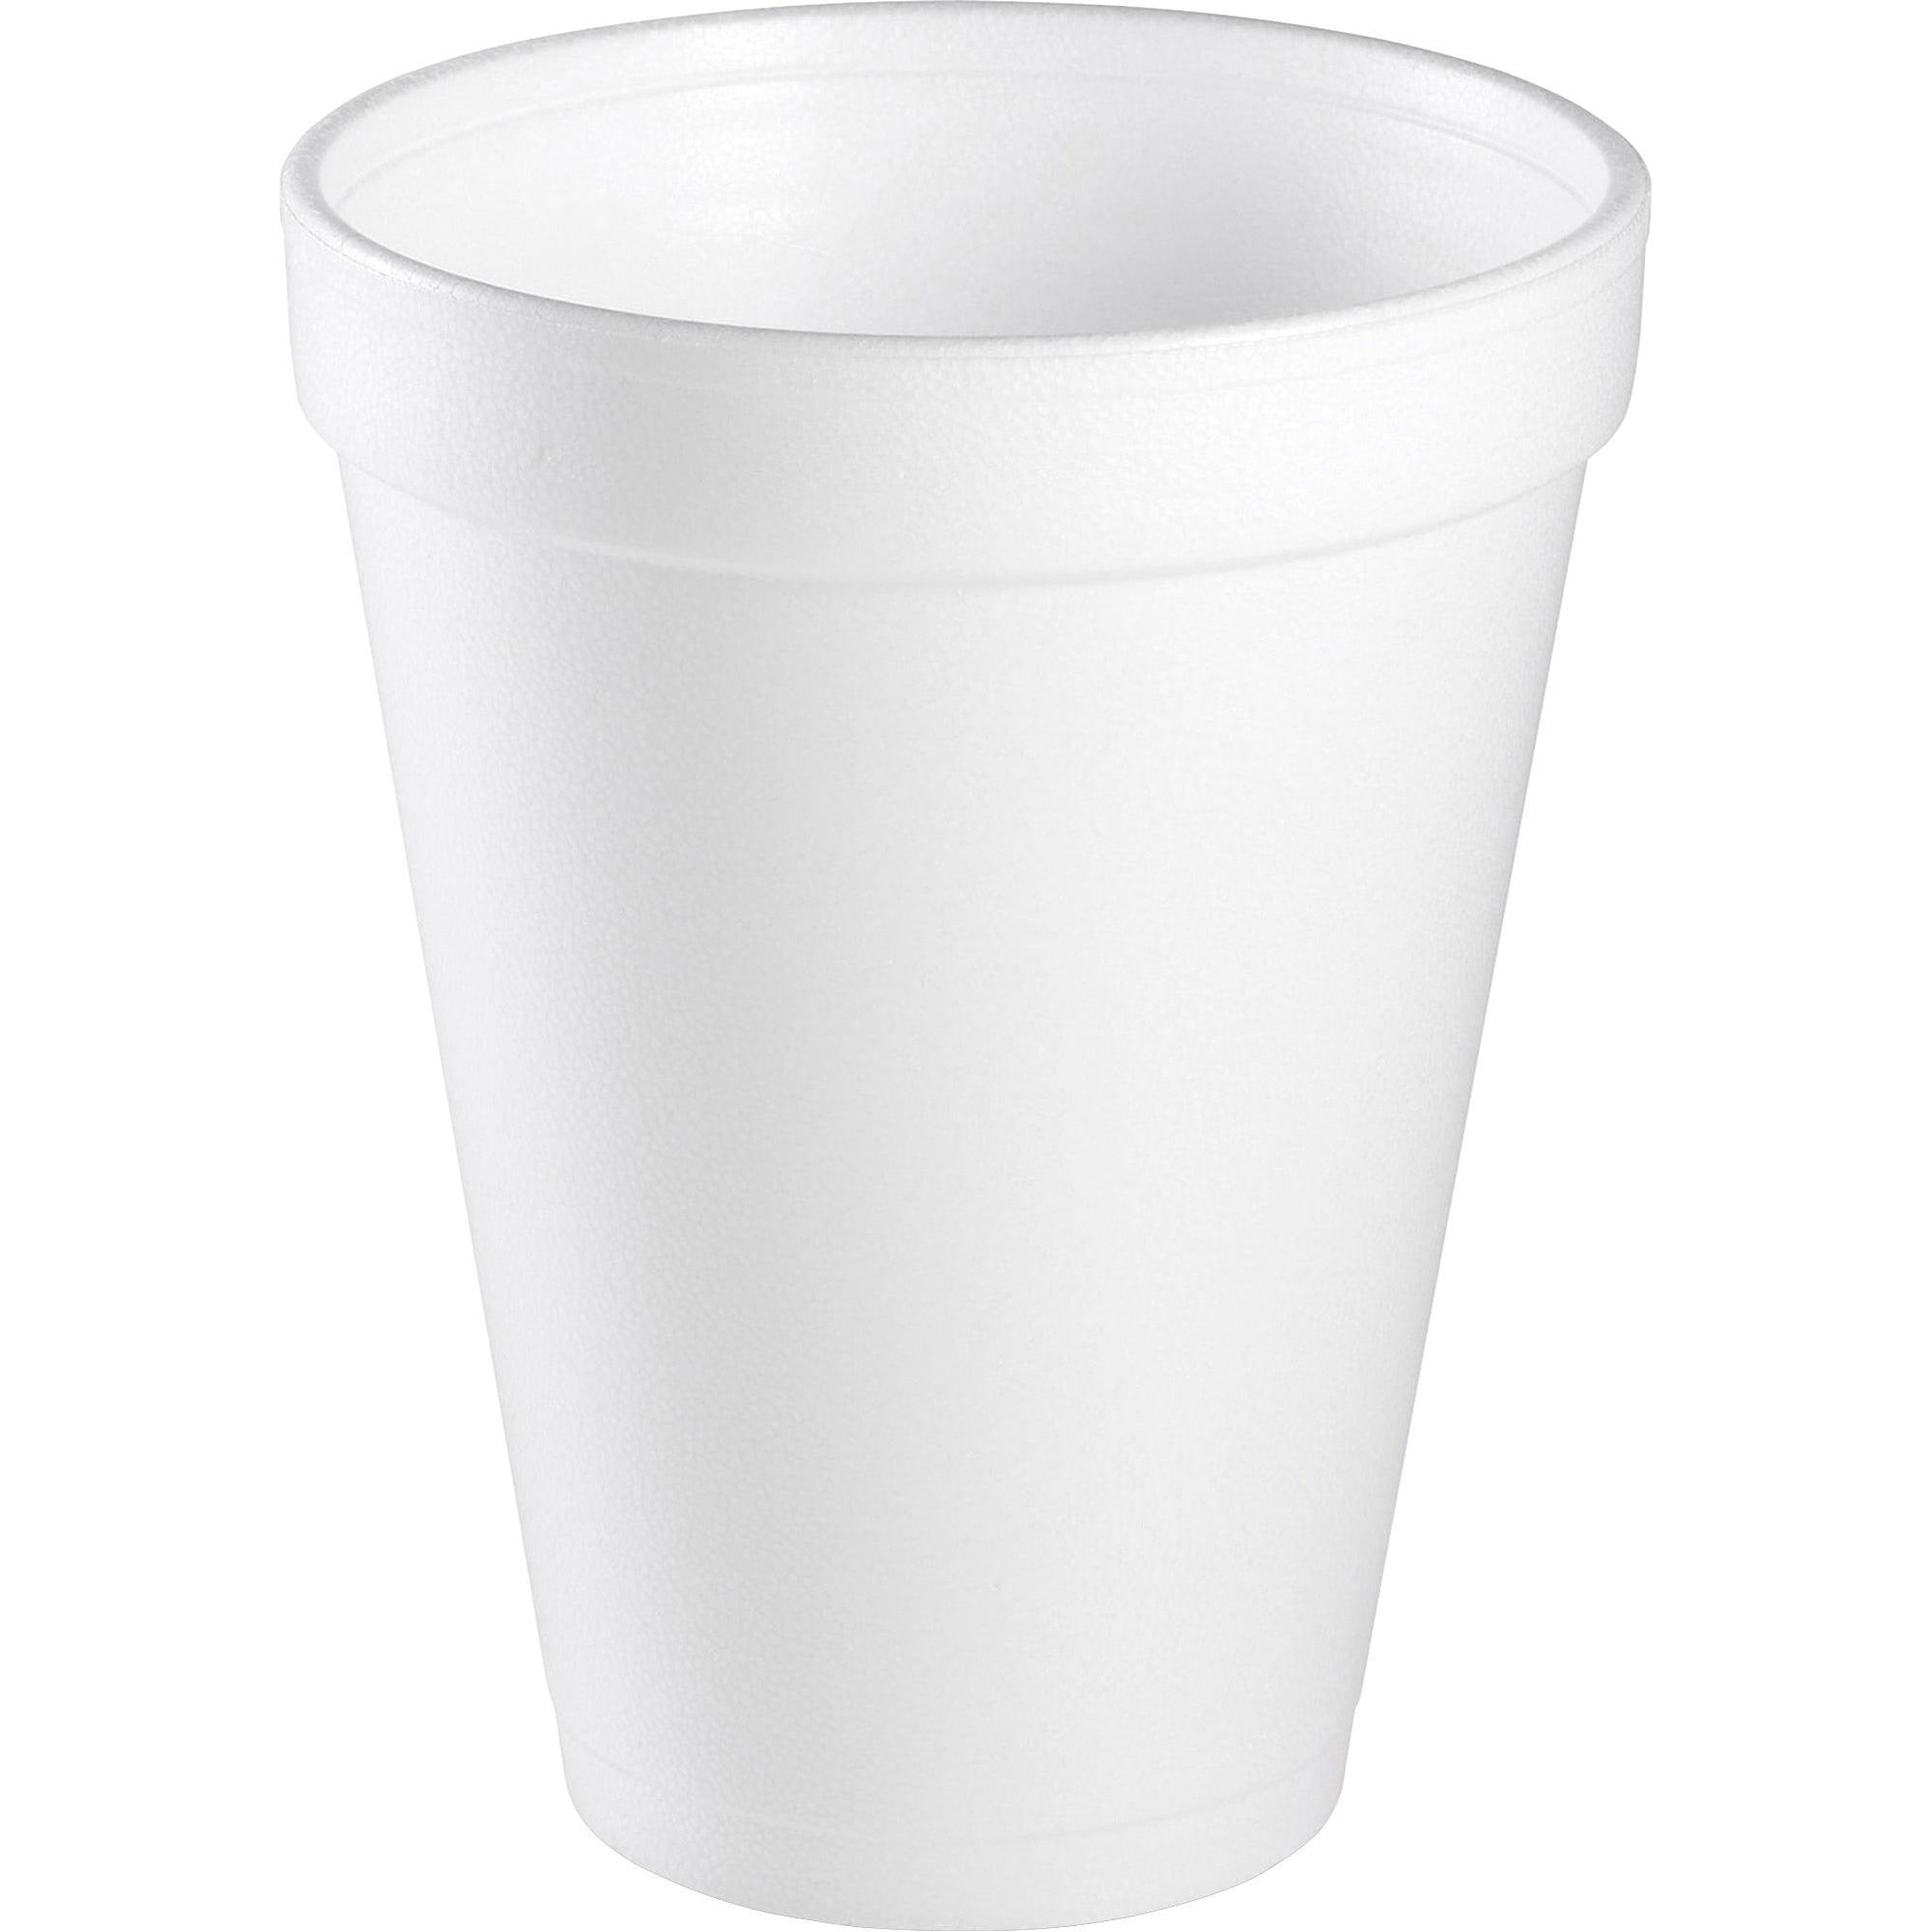 Dart Drink Foam Cups, 12 oz, White, 1000 ct